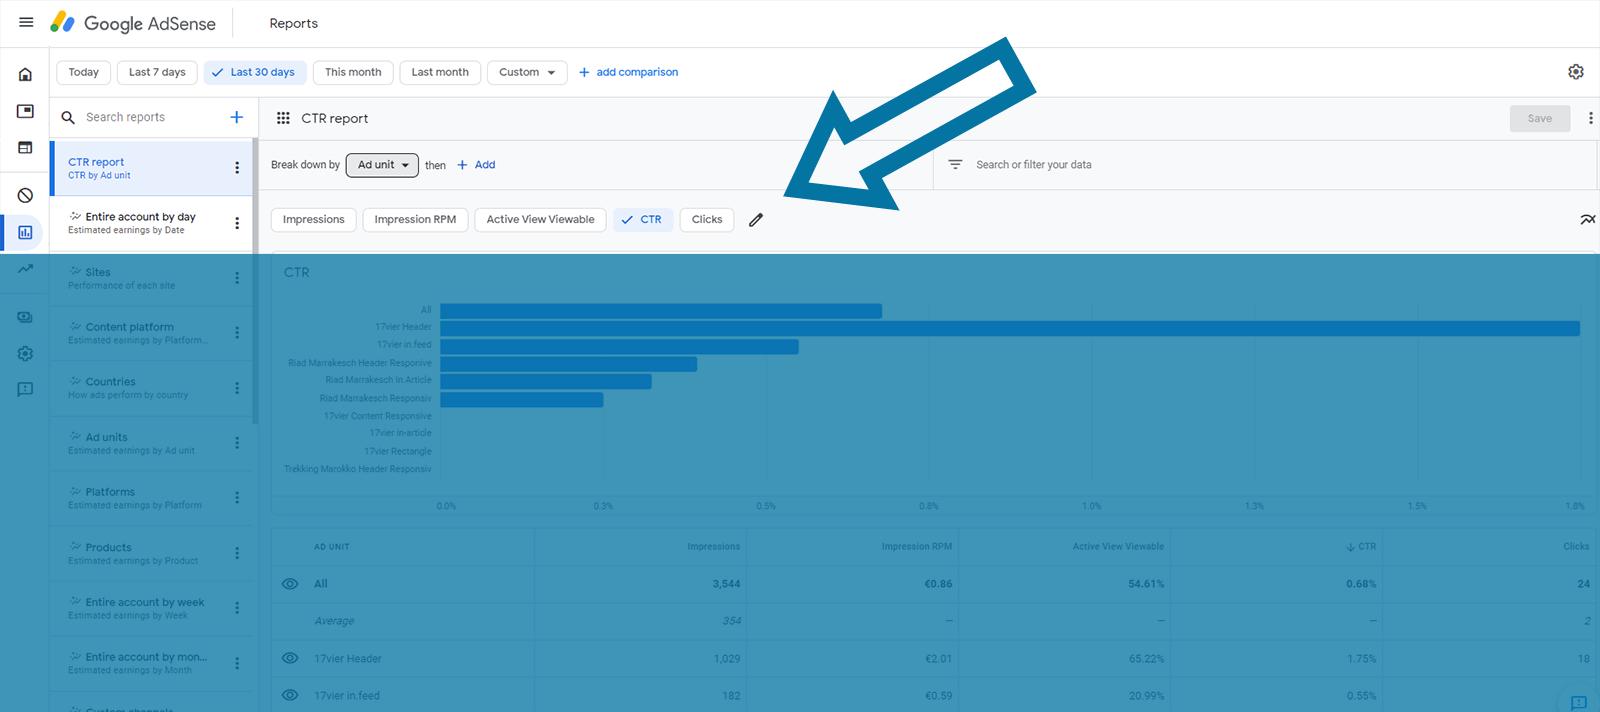 CTR Report in the Google AdSense statistics